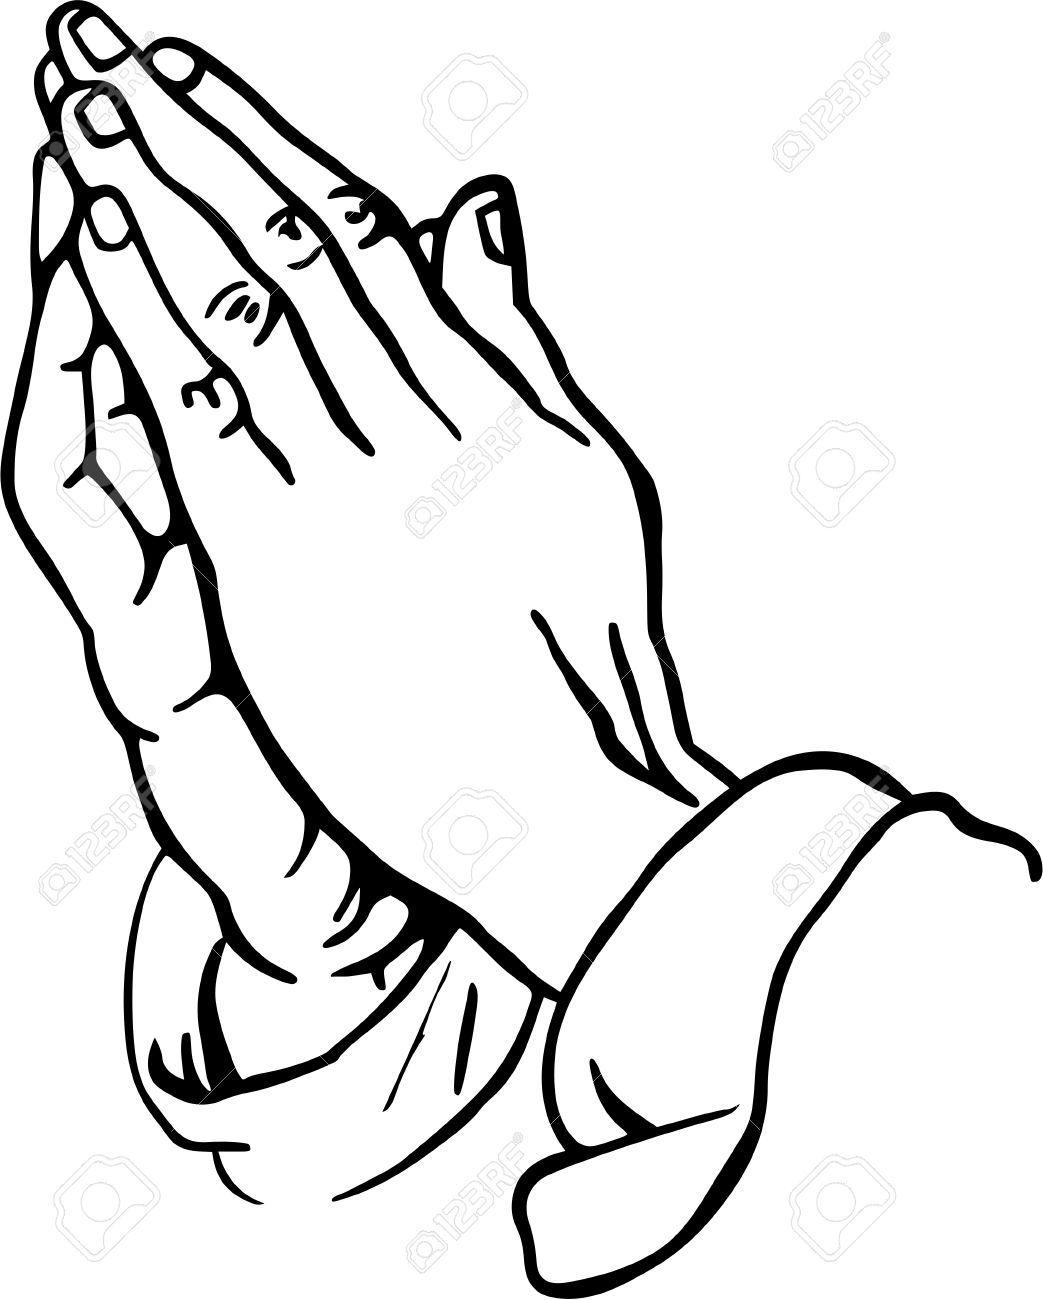 Praying Hands Clipart   Praying hands clipart, Praying ...